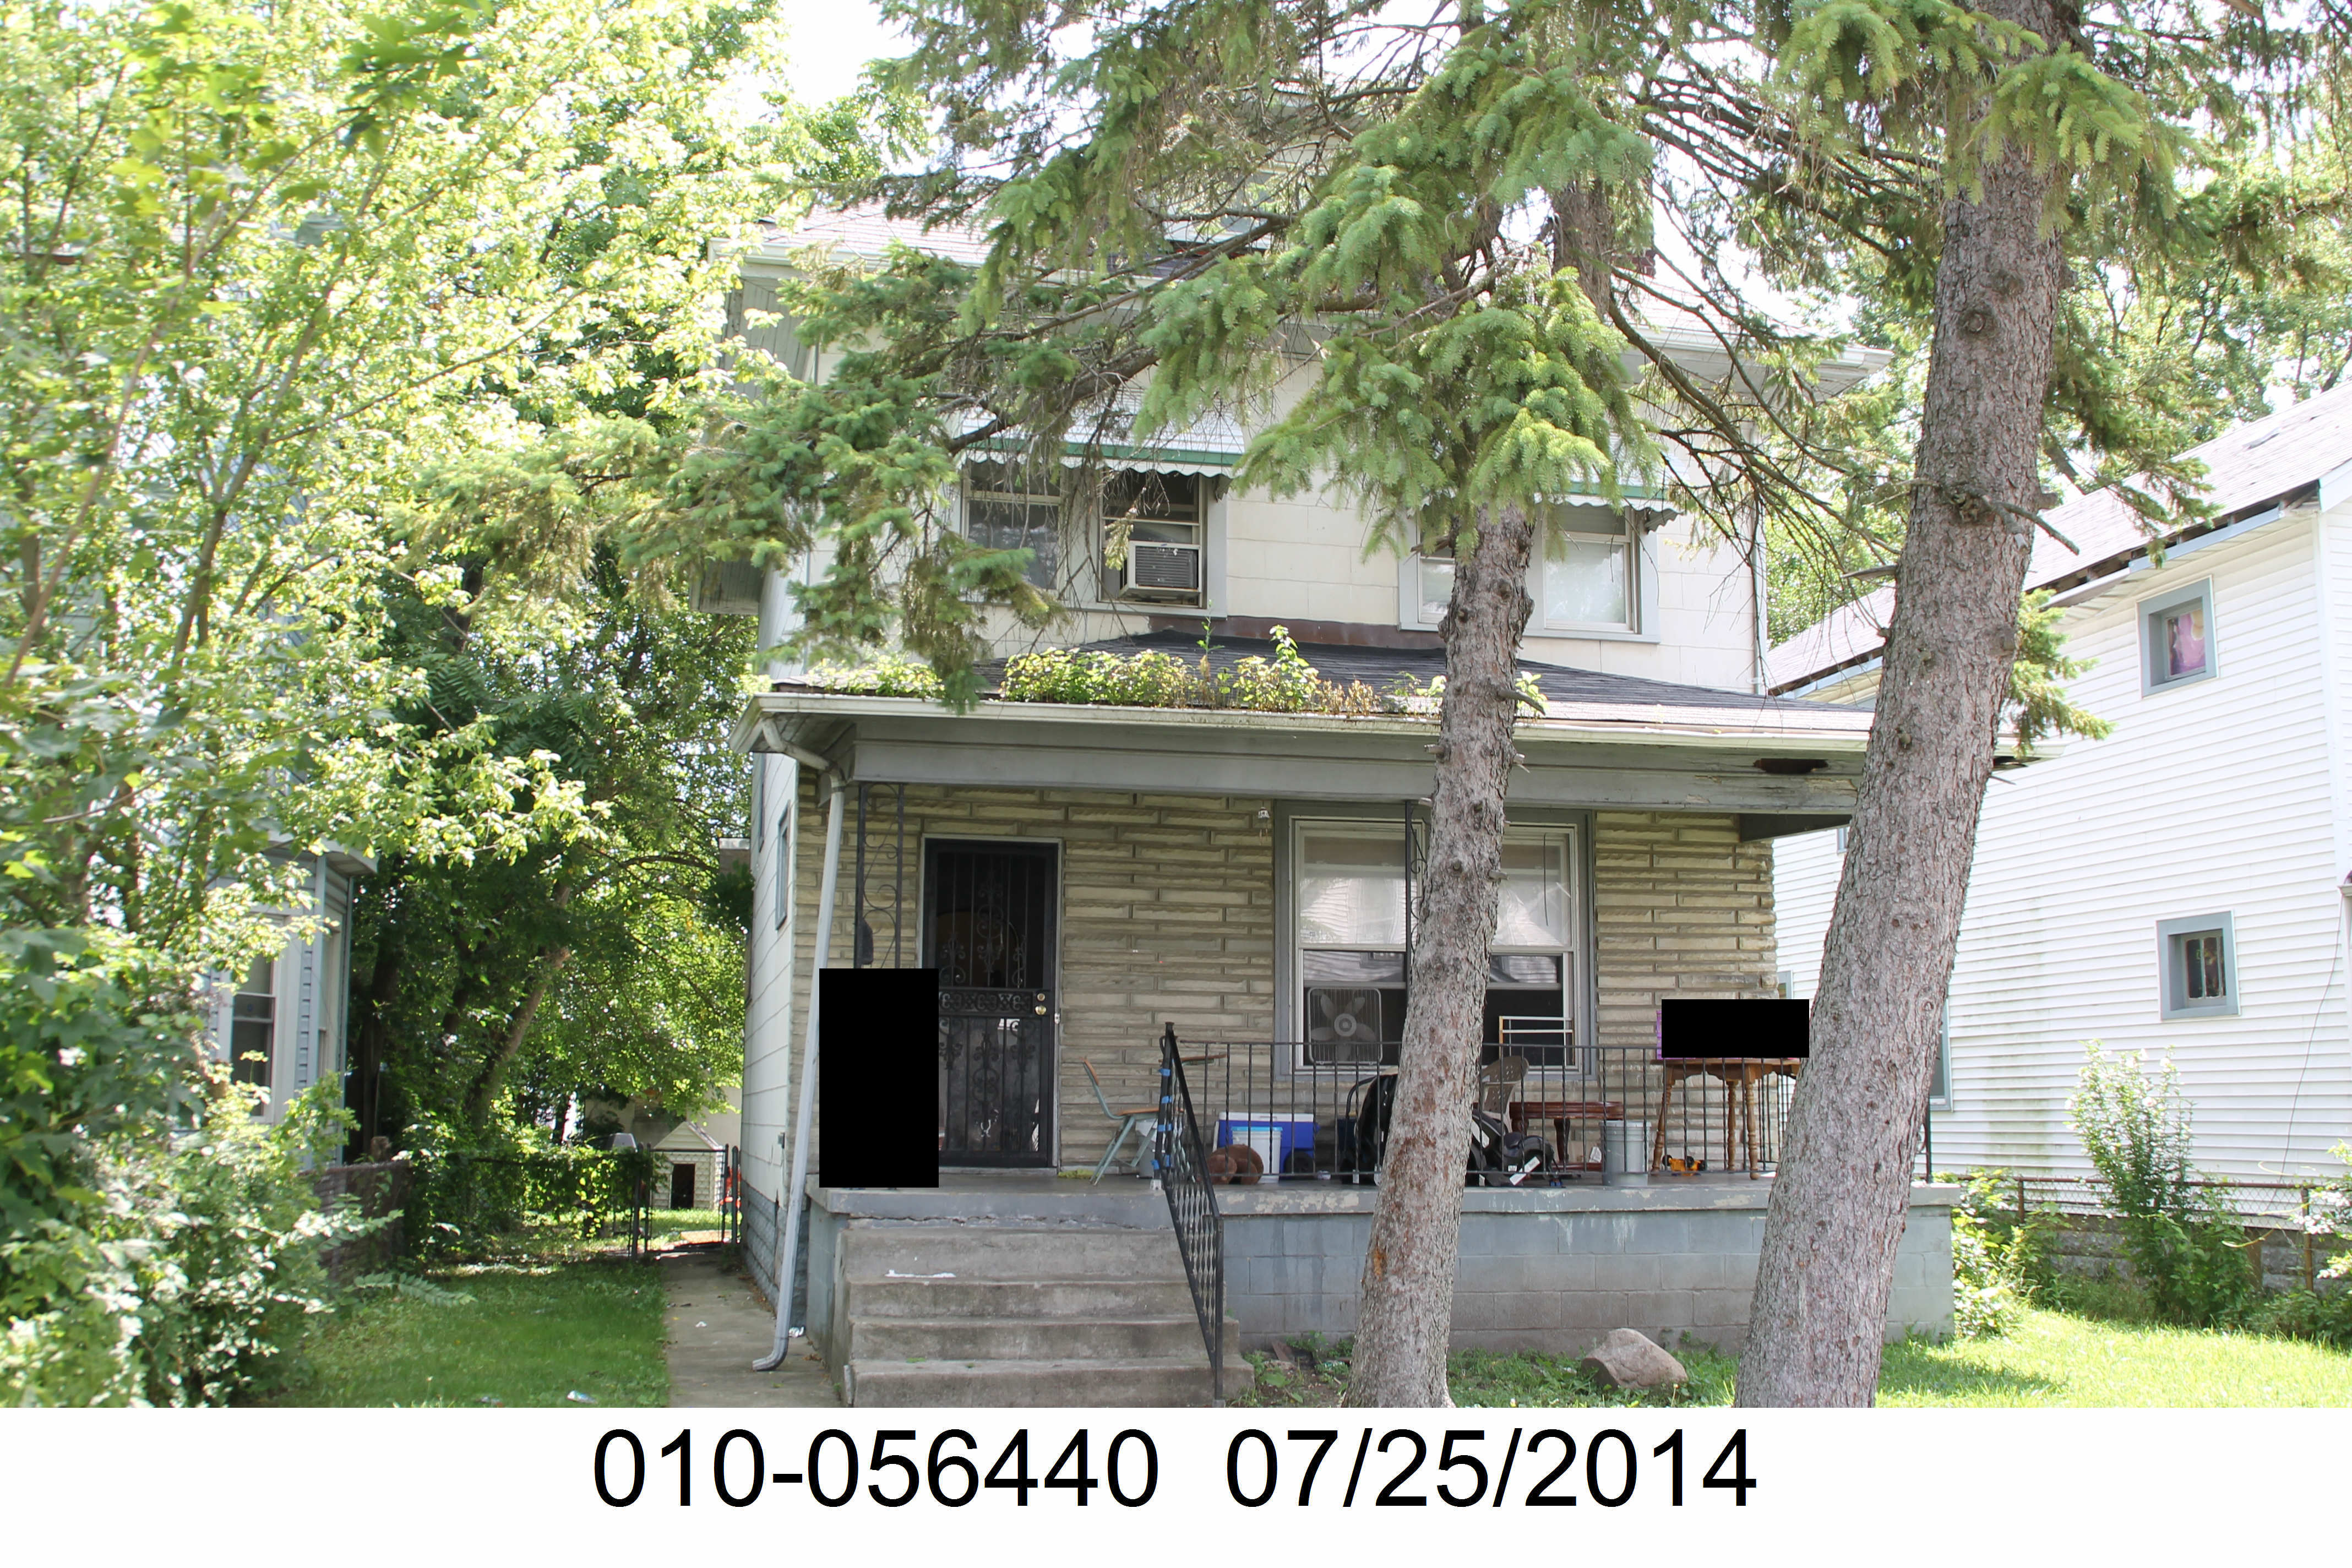 348 Midland Ave, Columbus, OH